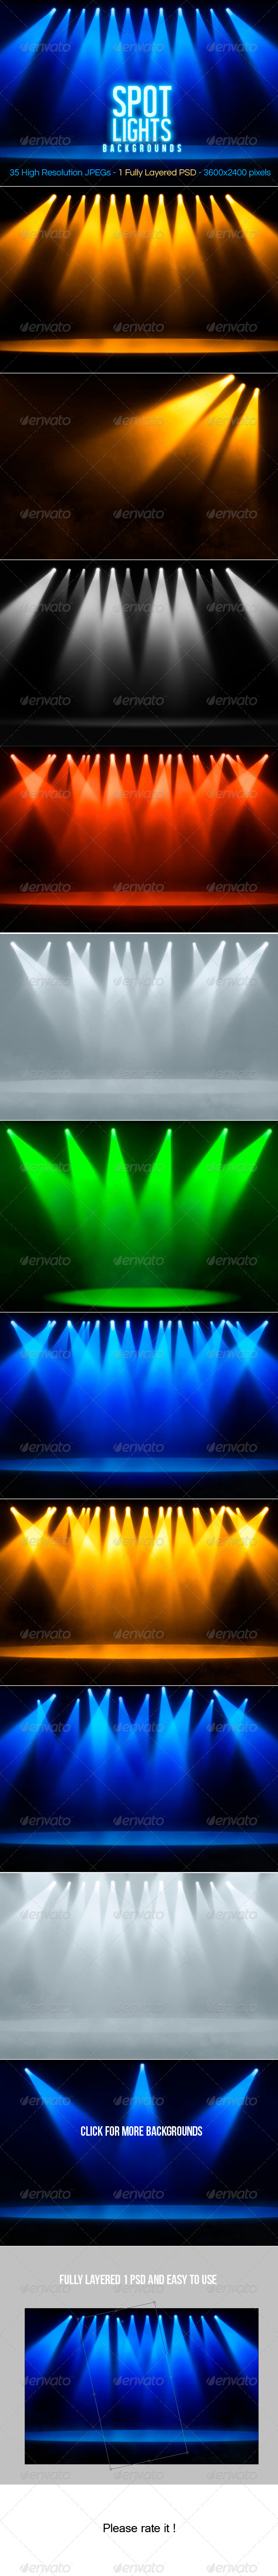 GraphicRiver Spotlights Backgrounds 4120432